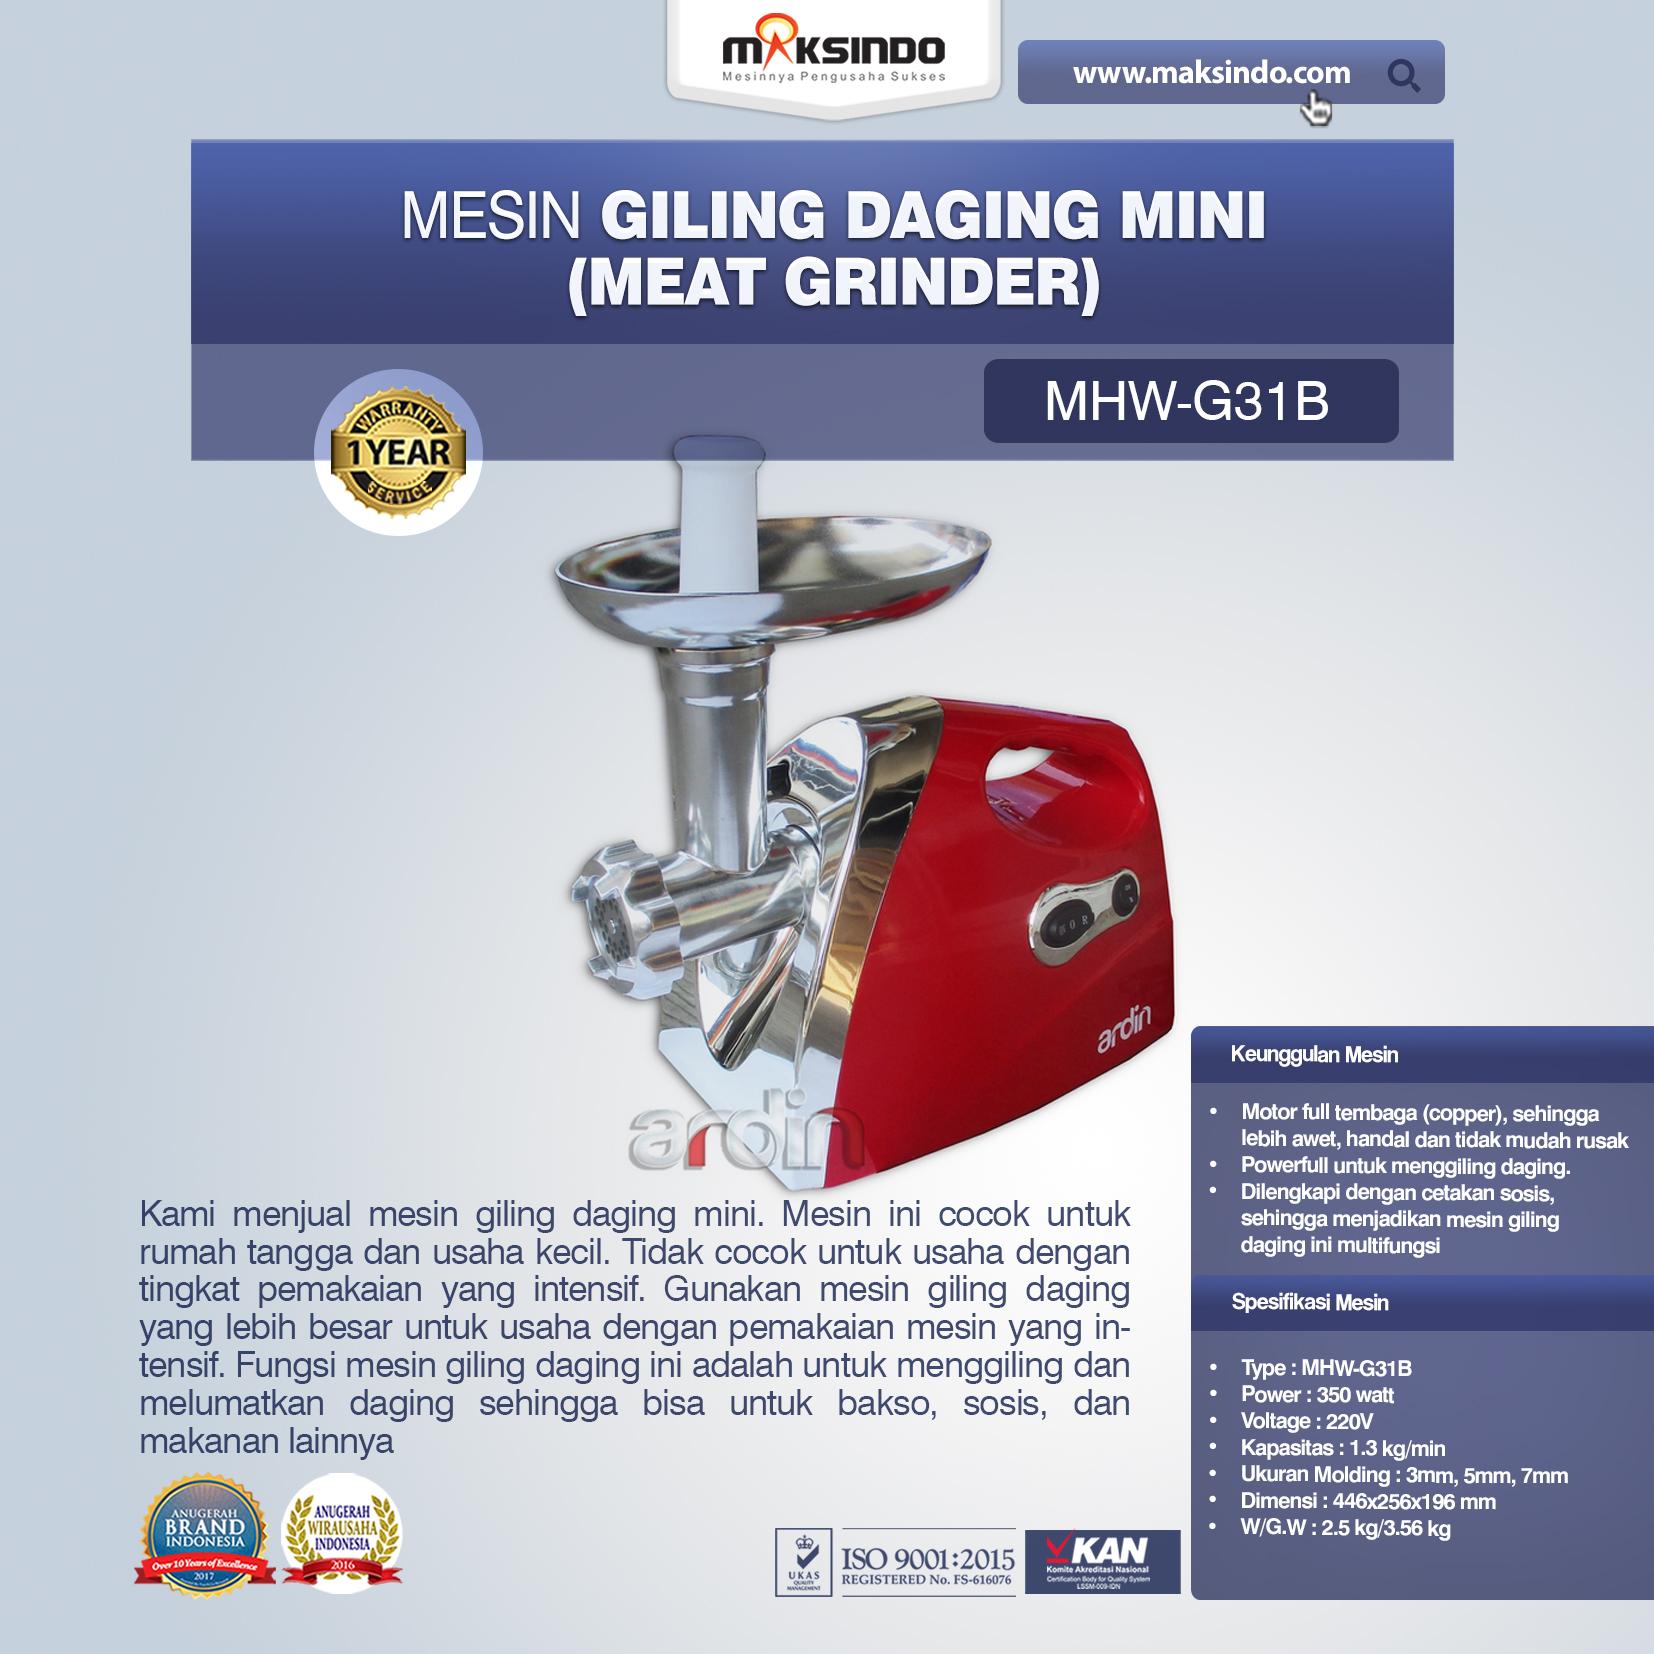 Jual Mesin Giling Daging Mini (Rumah Tangga) – Ardin di Blitar